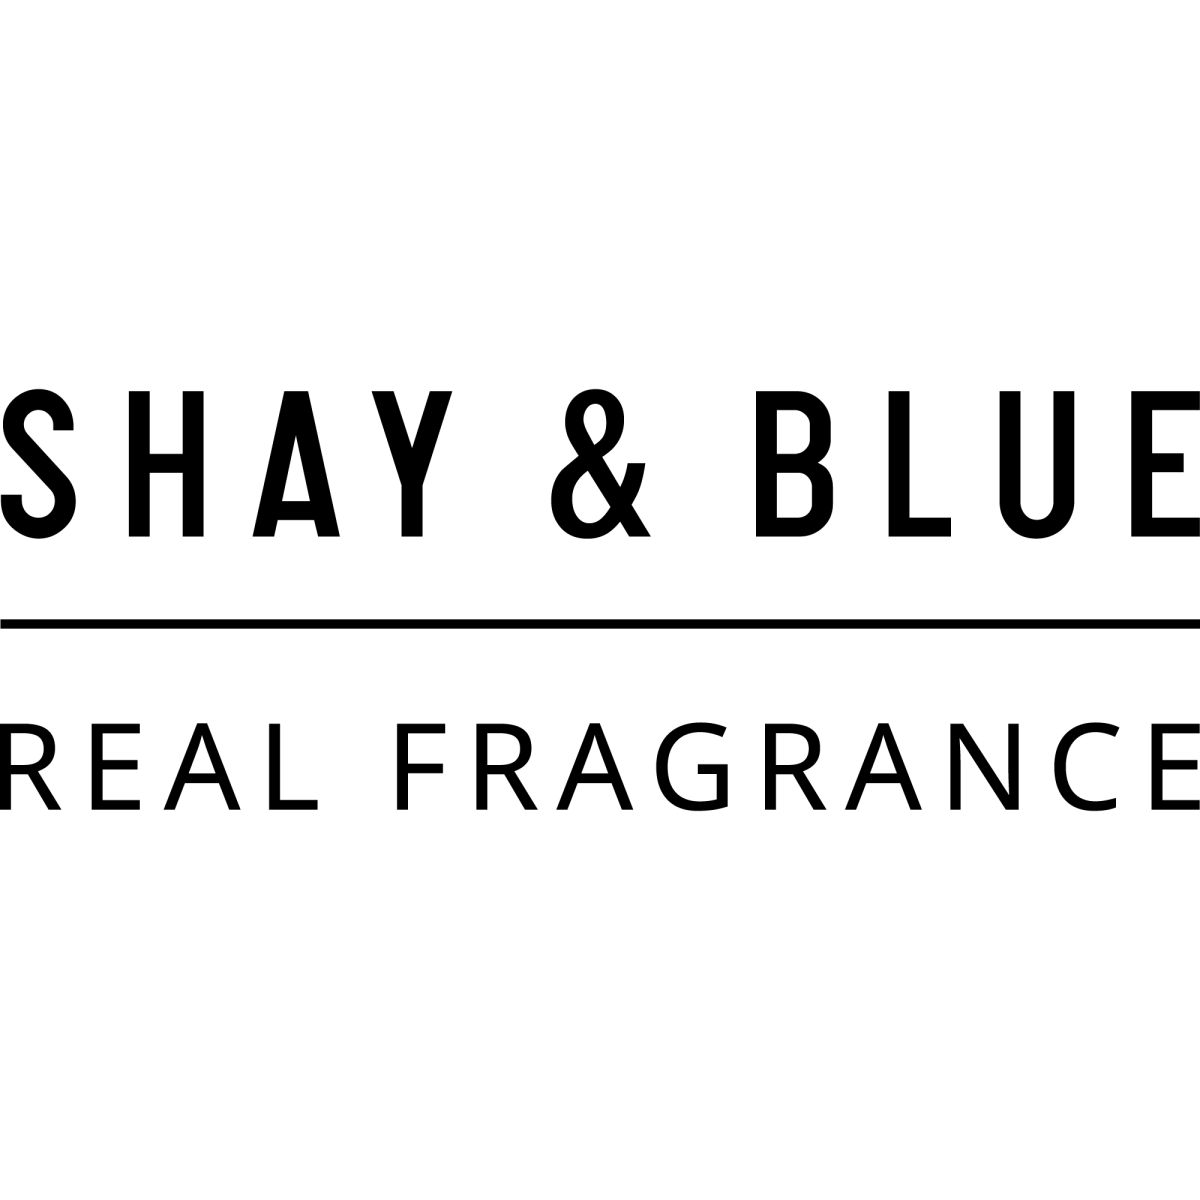 Shay & Blue